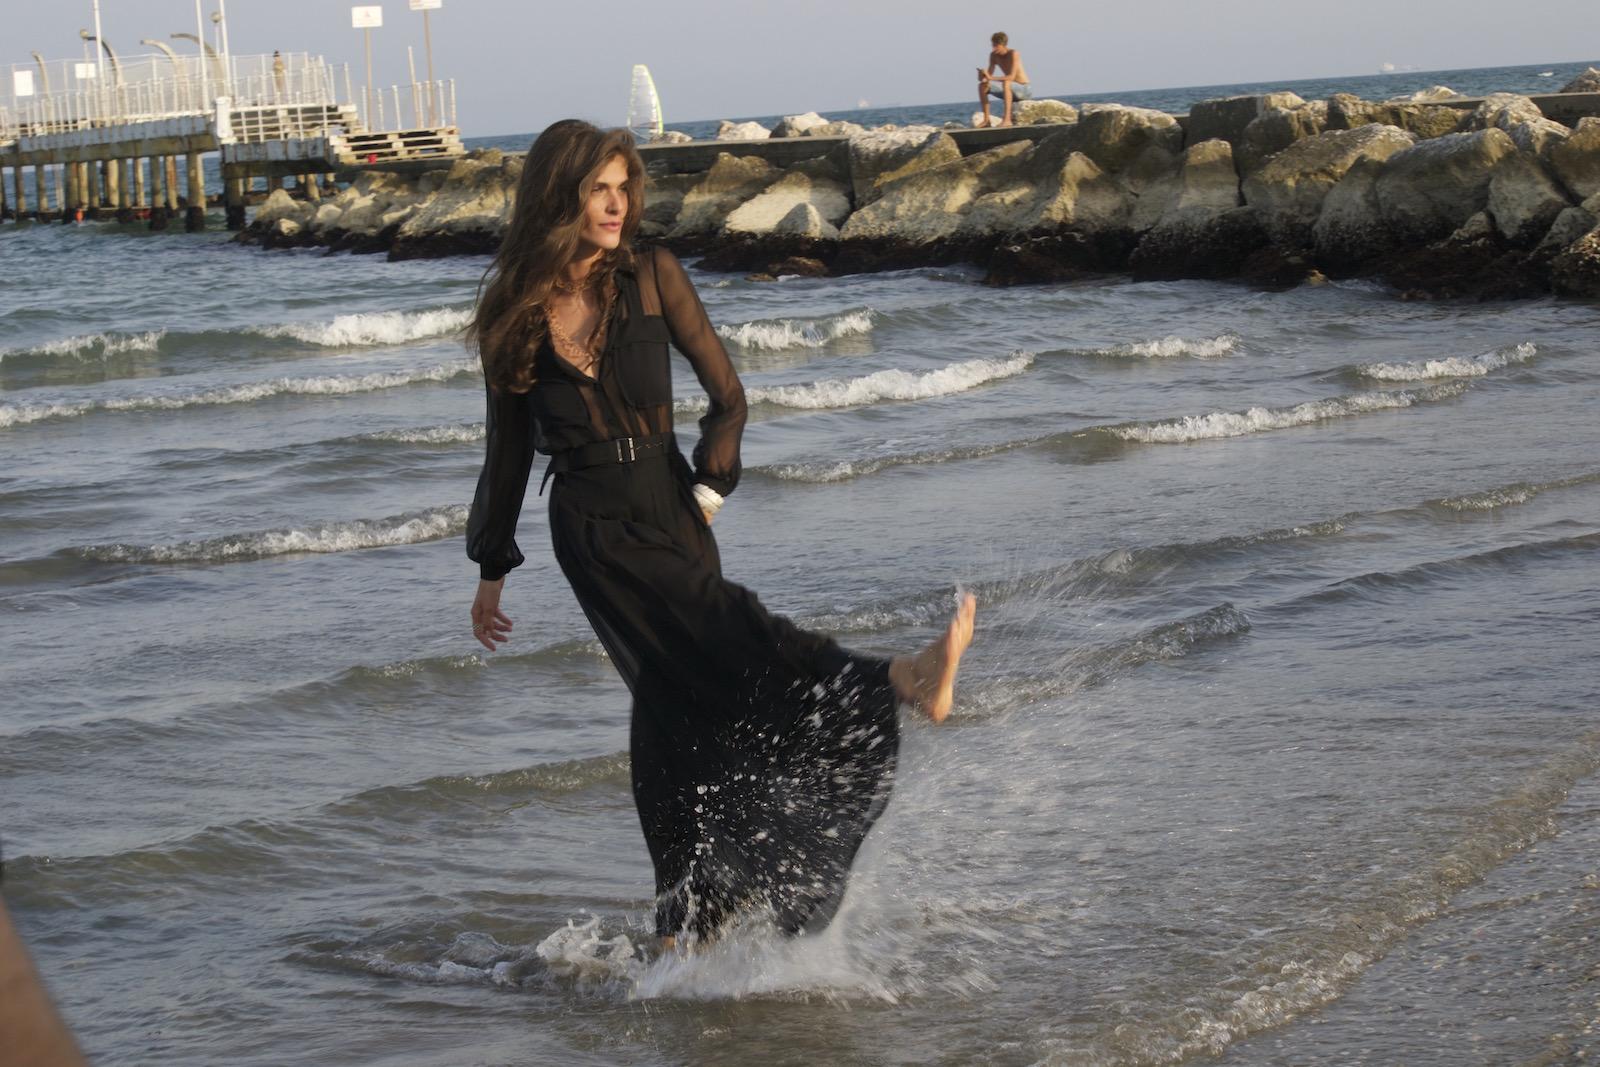 Venezia 2015: La madrina Elisa Sednaoui scherza al photocall